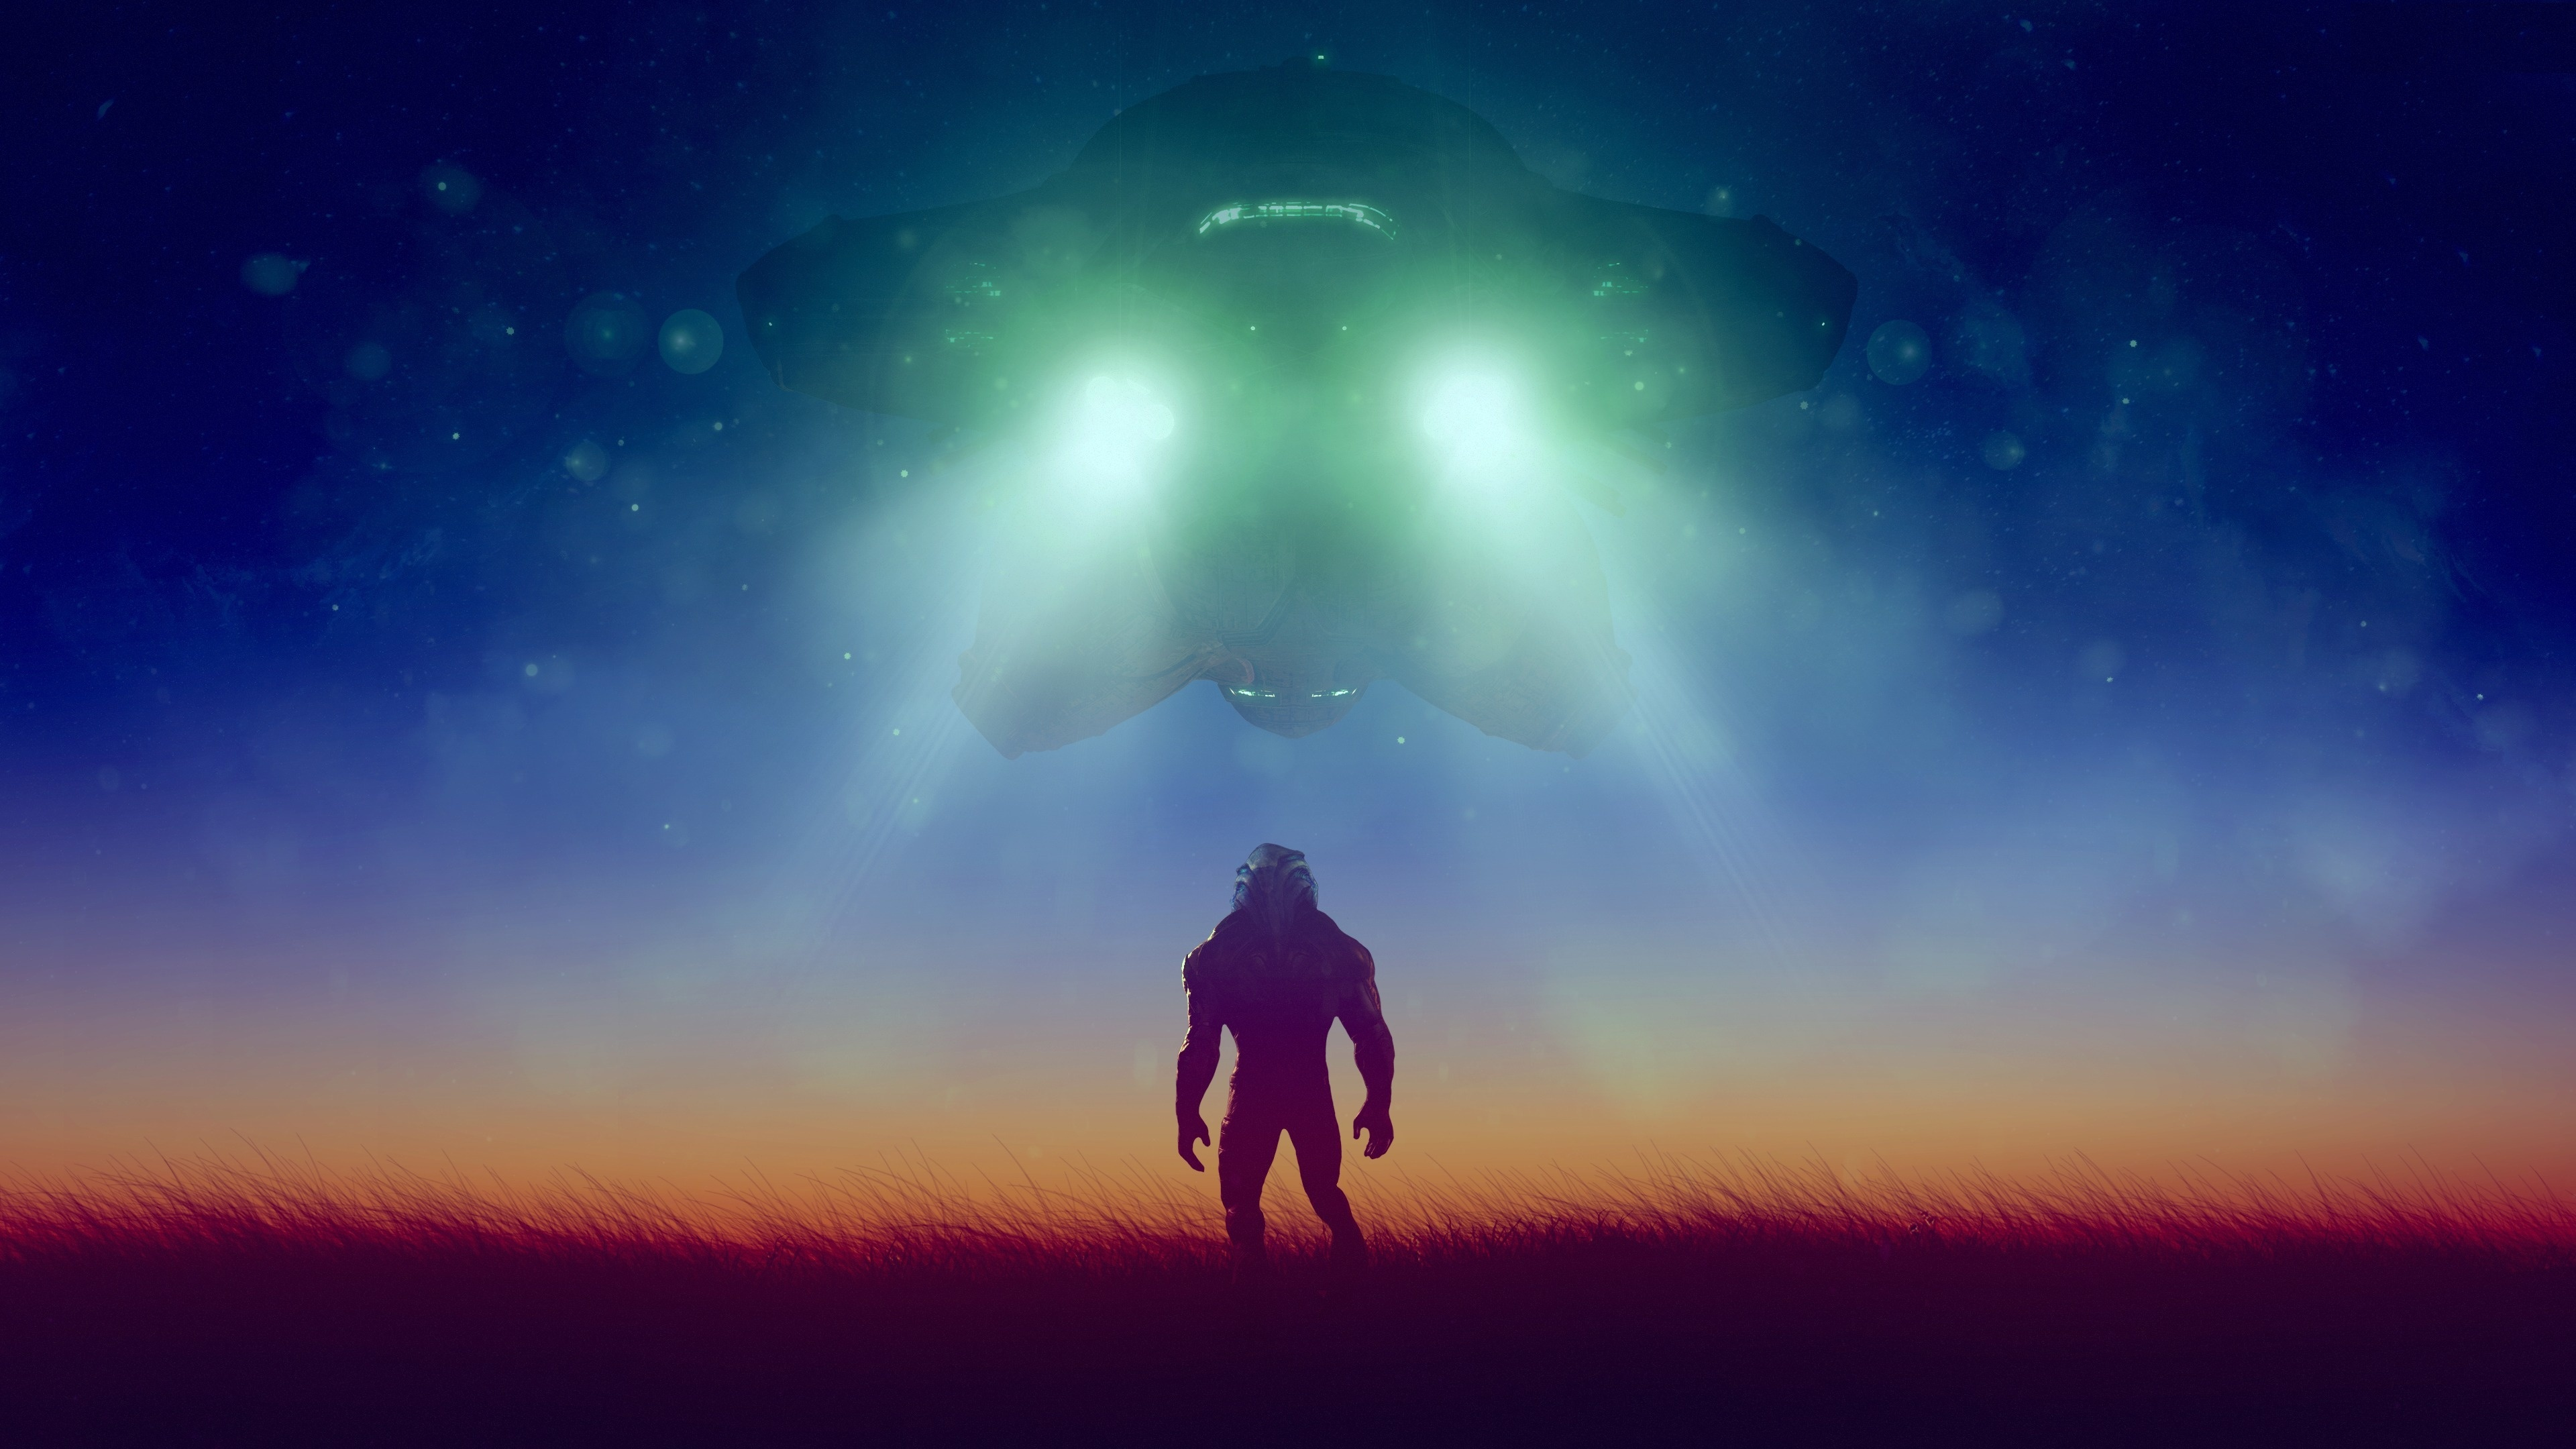 Download 3840x2400 Wallpaper Mass Effect Andromeda Extermination